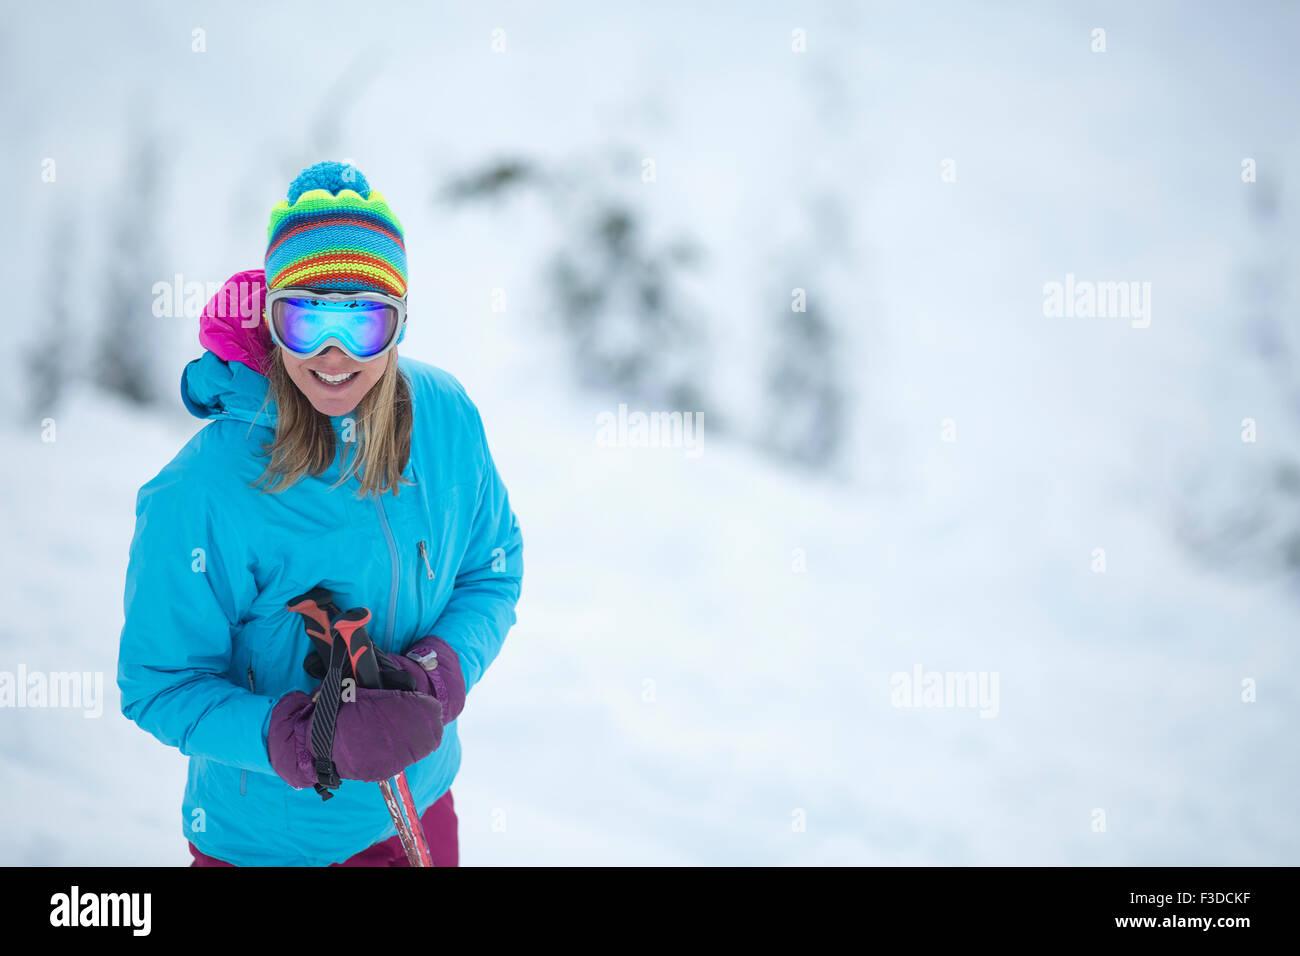 Smiley Trägerin Skibekleidung auf Skipiste Stockbild